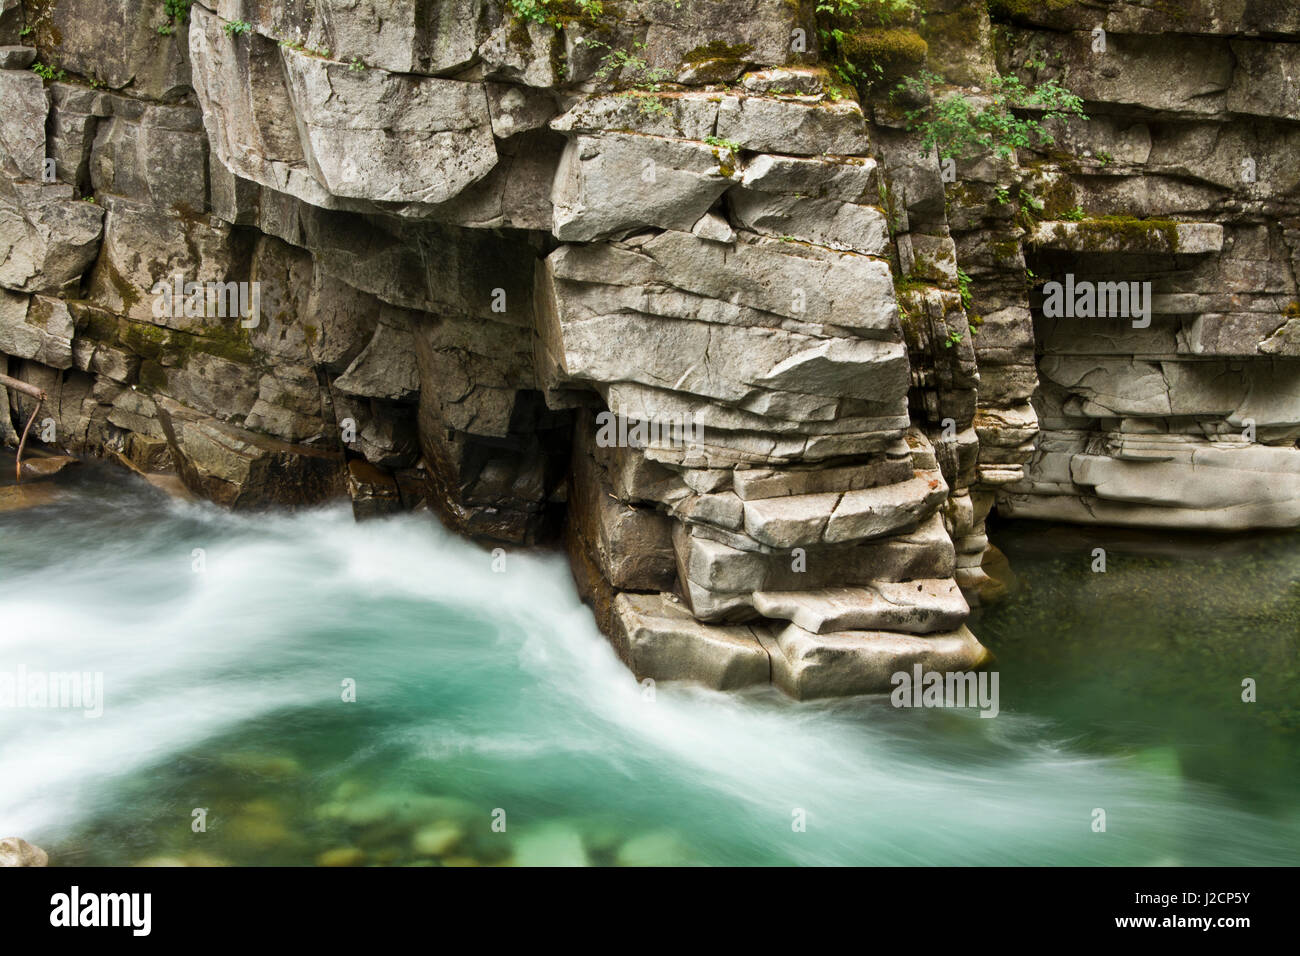 Río Coquihalla Coquihalla River Provincial Park, Coquihalla Canyon, Esperanza, British Columbia, Canadá Foto de stock